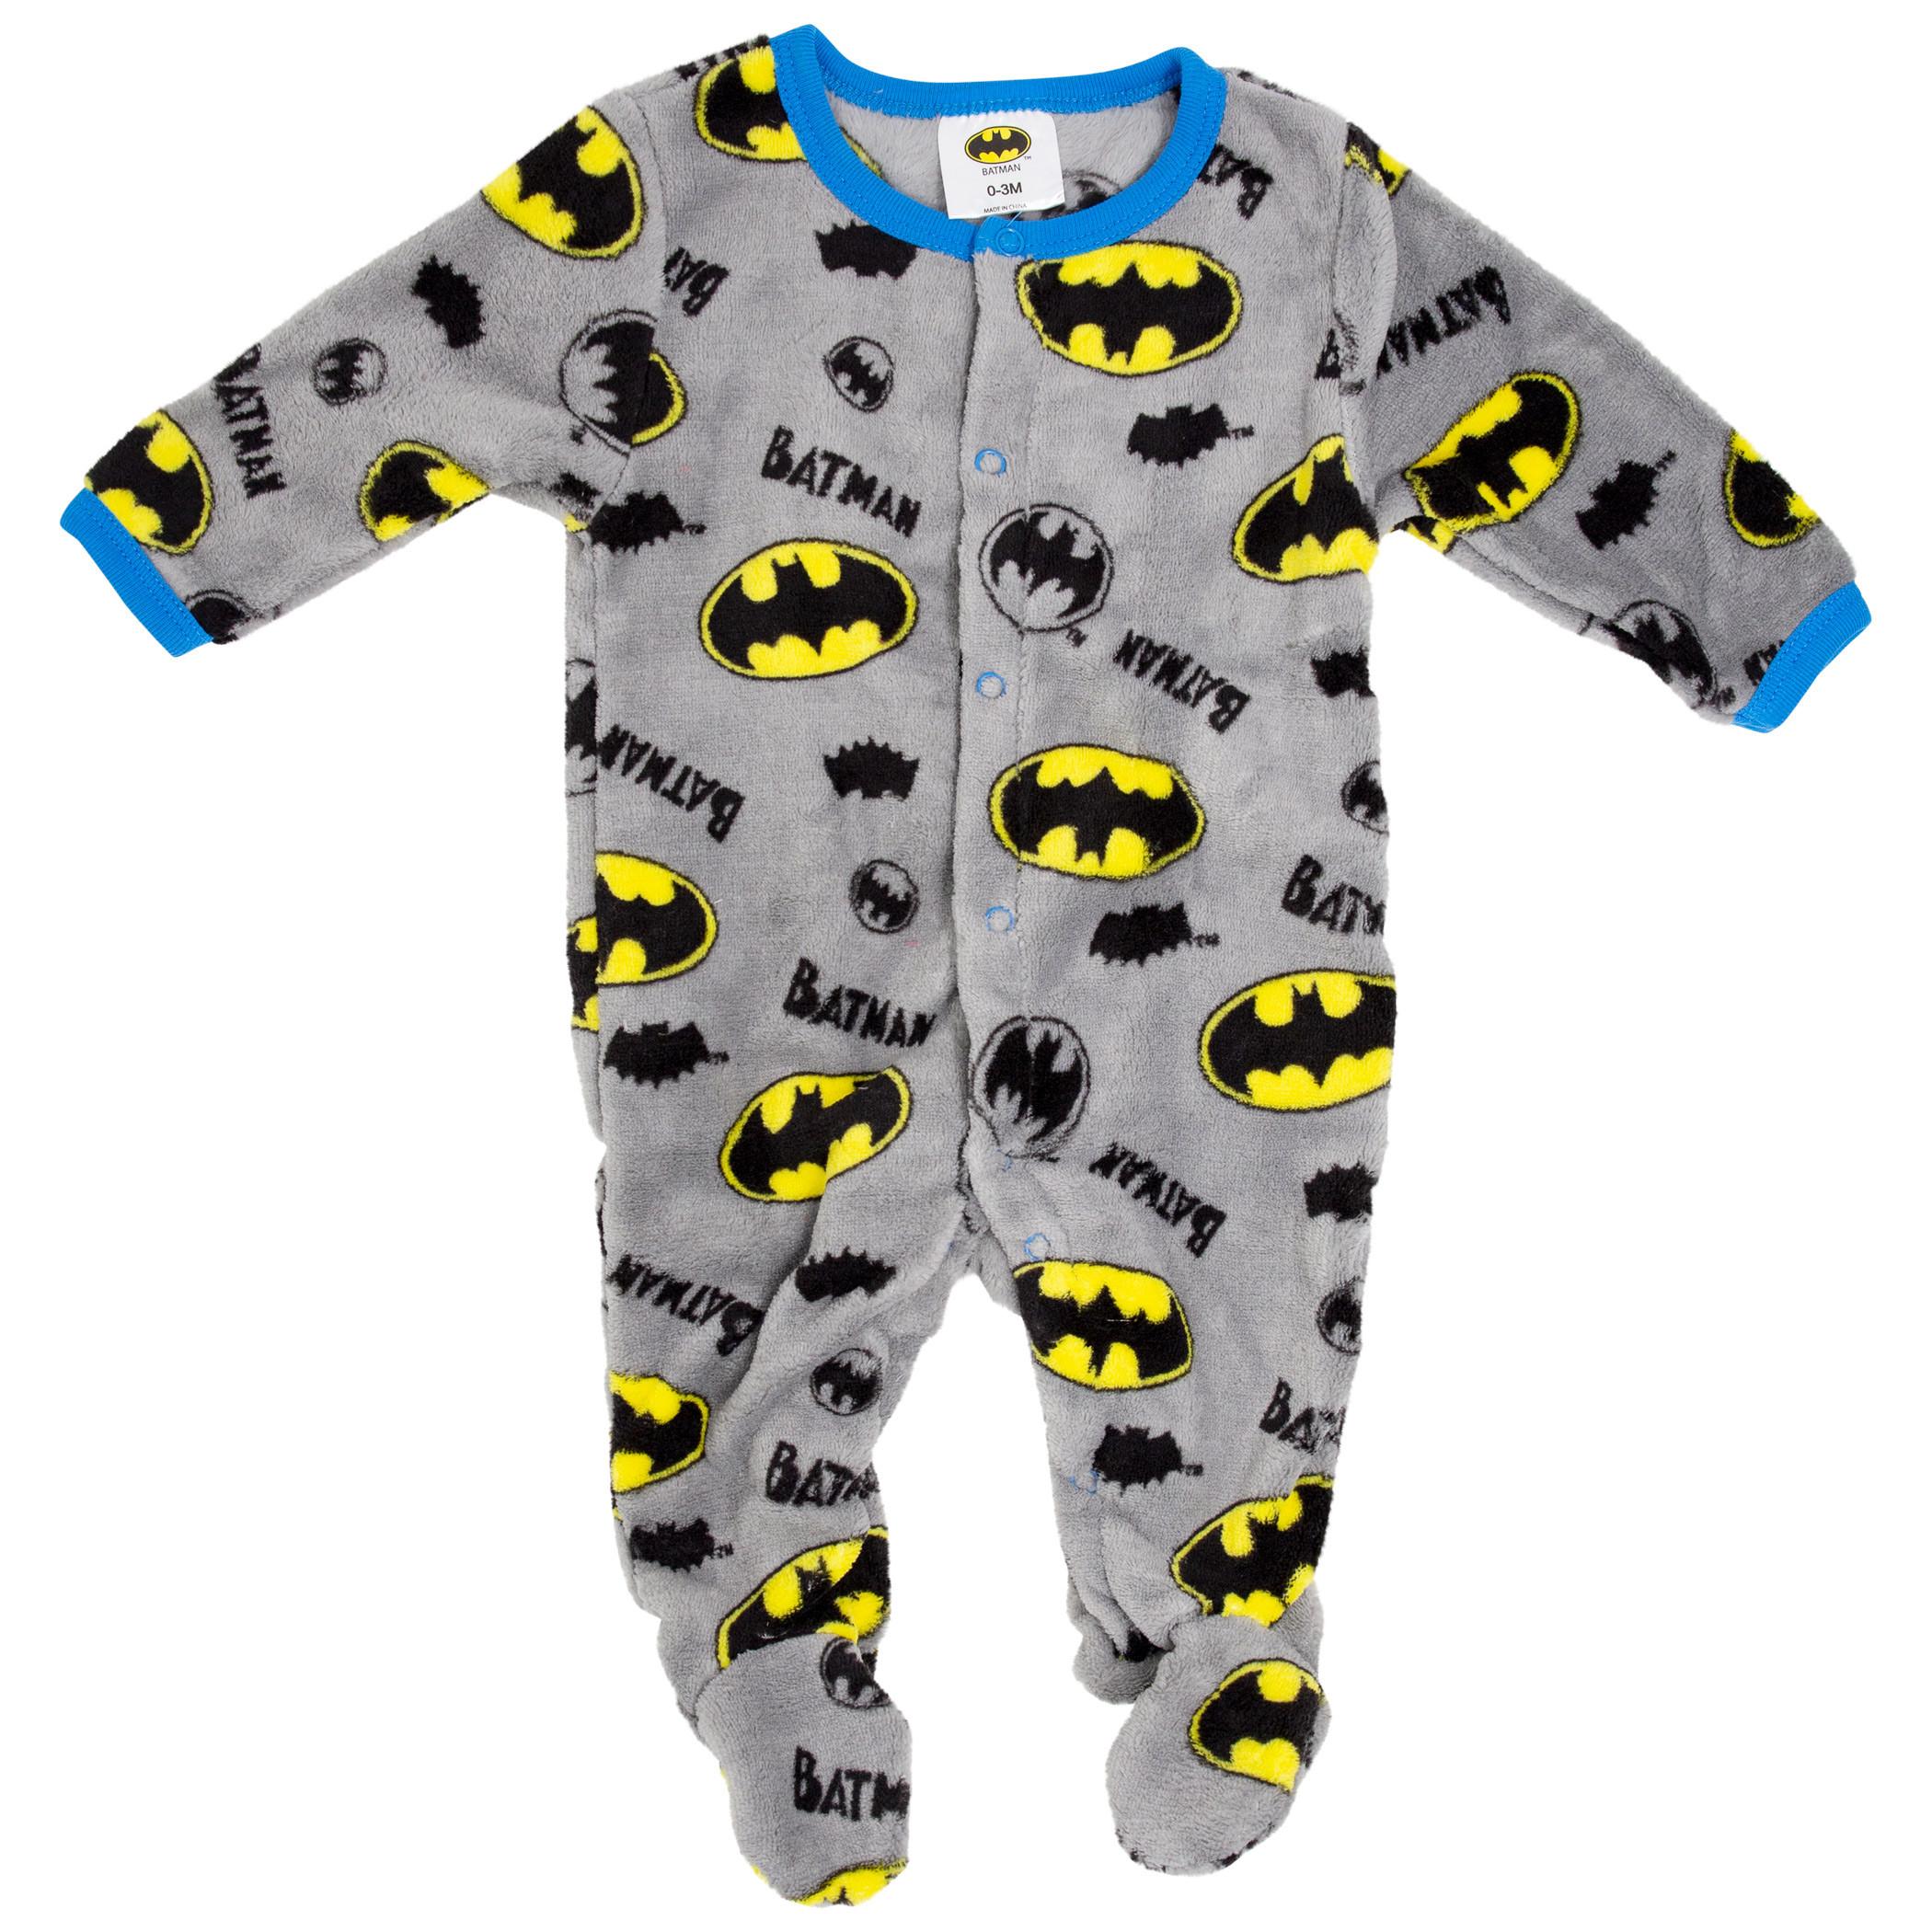 Batman Symbols Infant Onesie